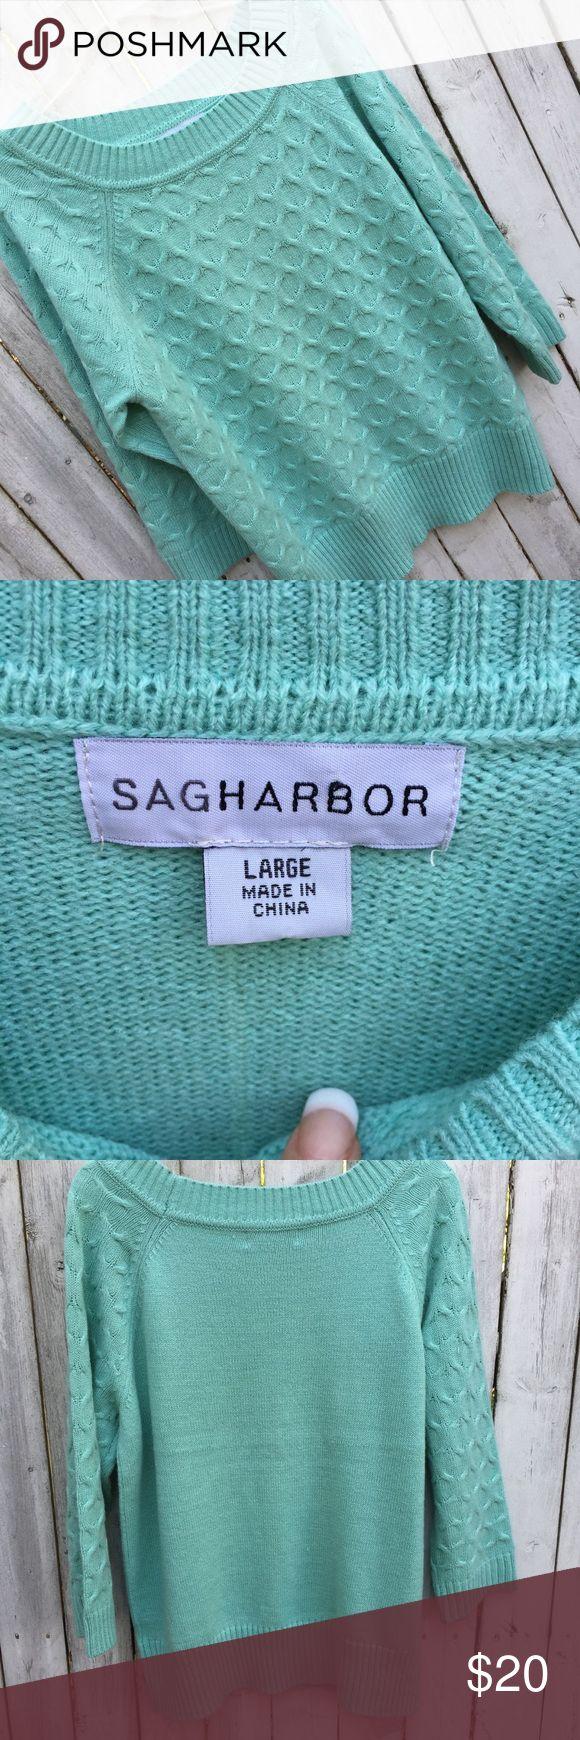 Sag harbor green 3/4 sleeve sweater L Sweater in excellent condition Sag Harbor Sweaters Crew & Scoop Necks